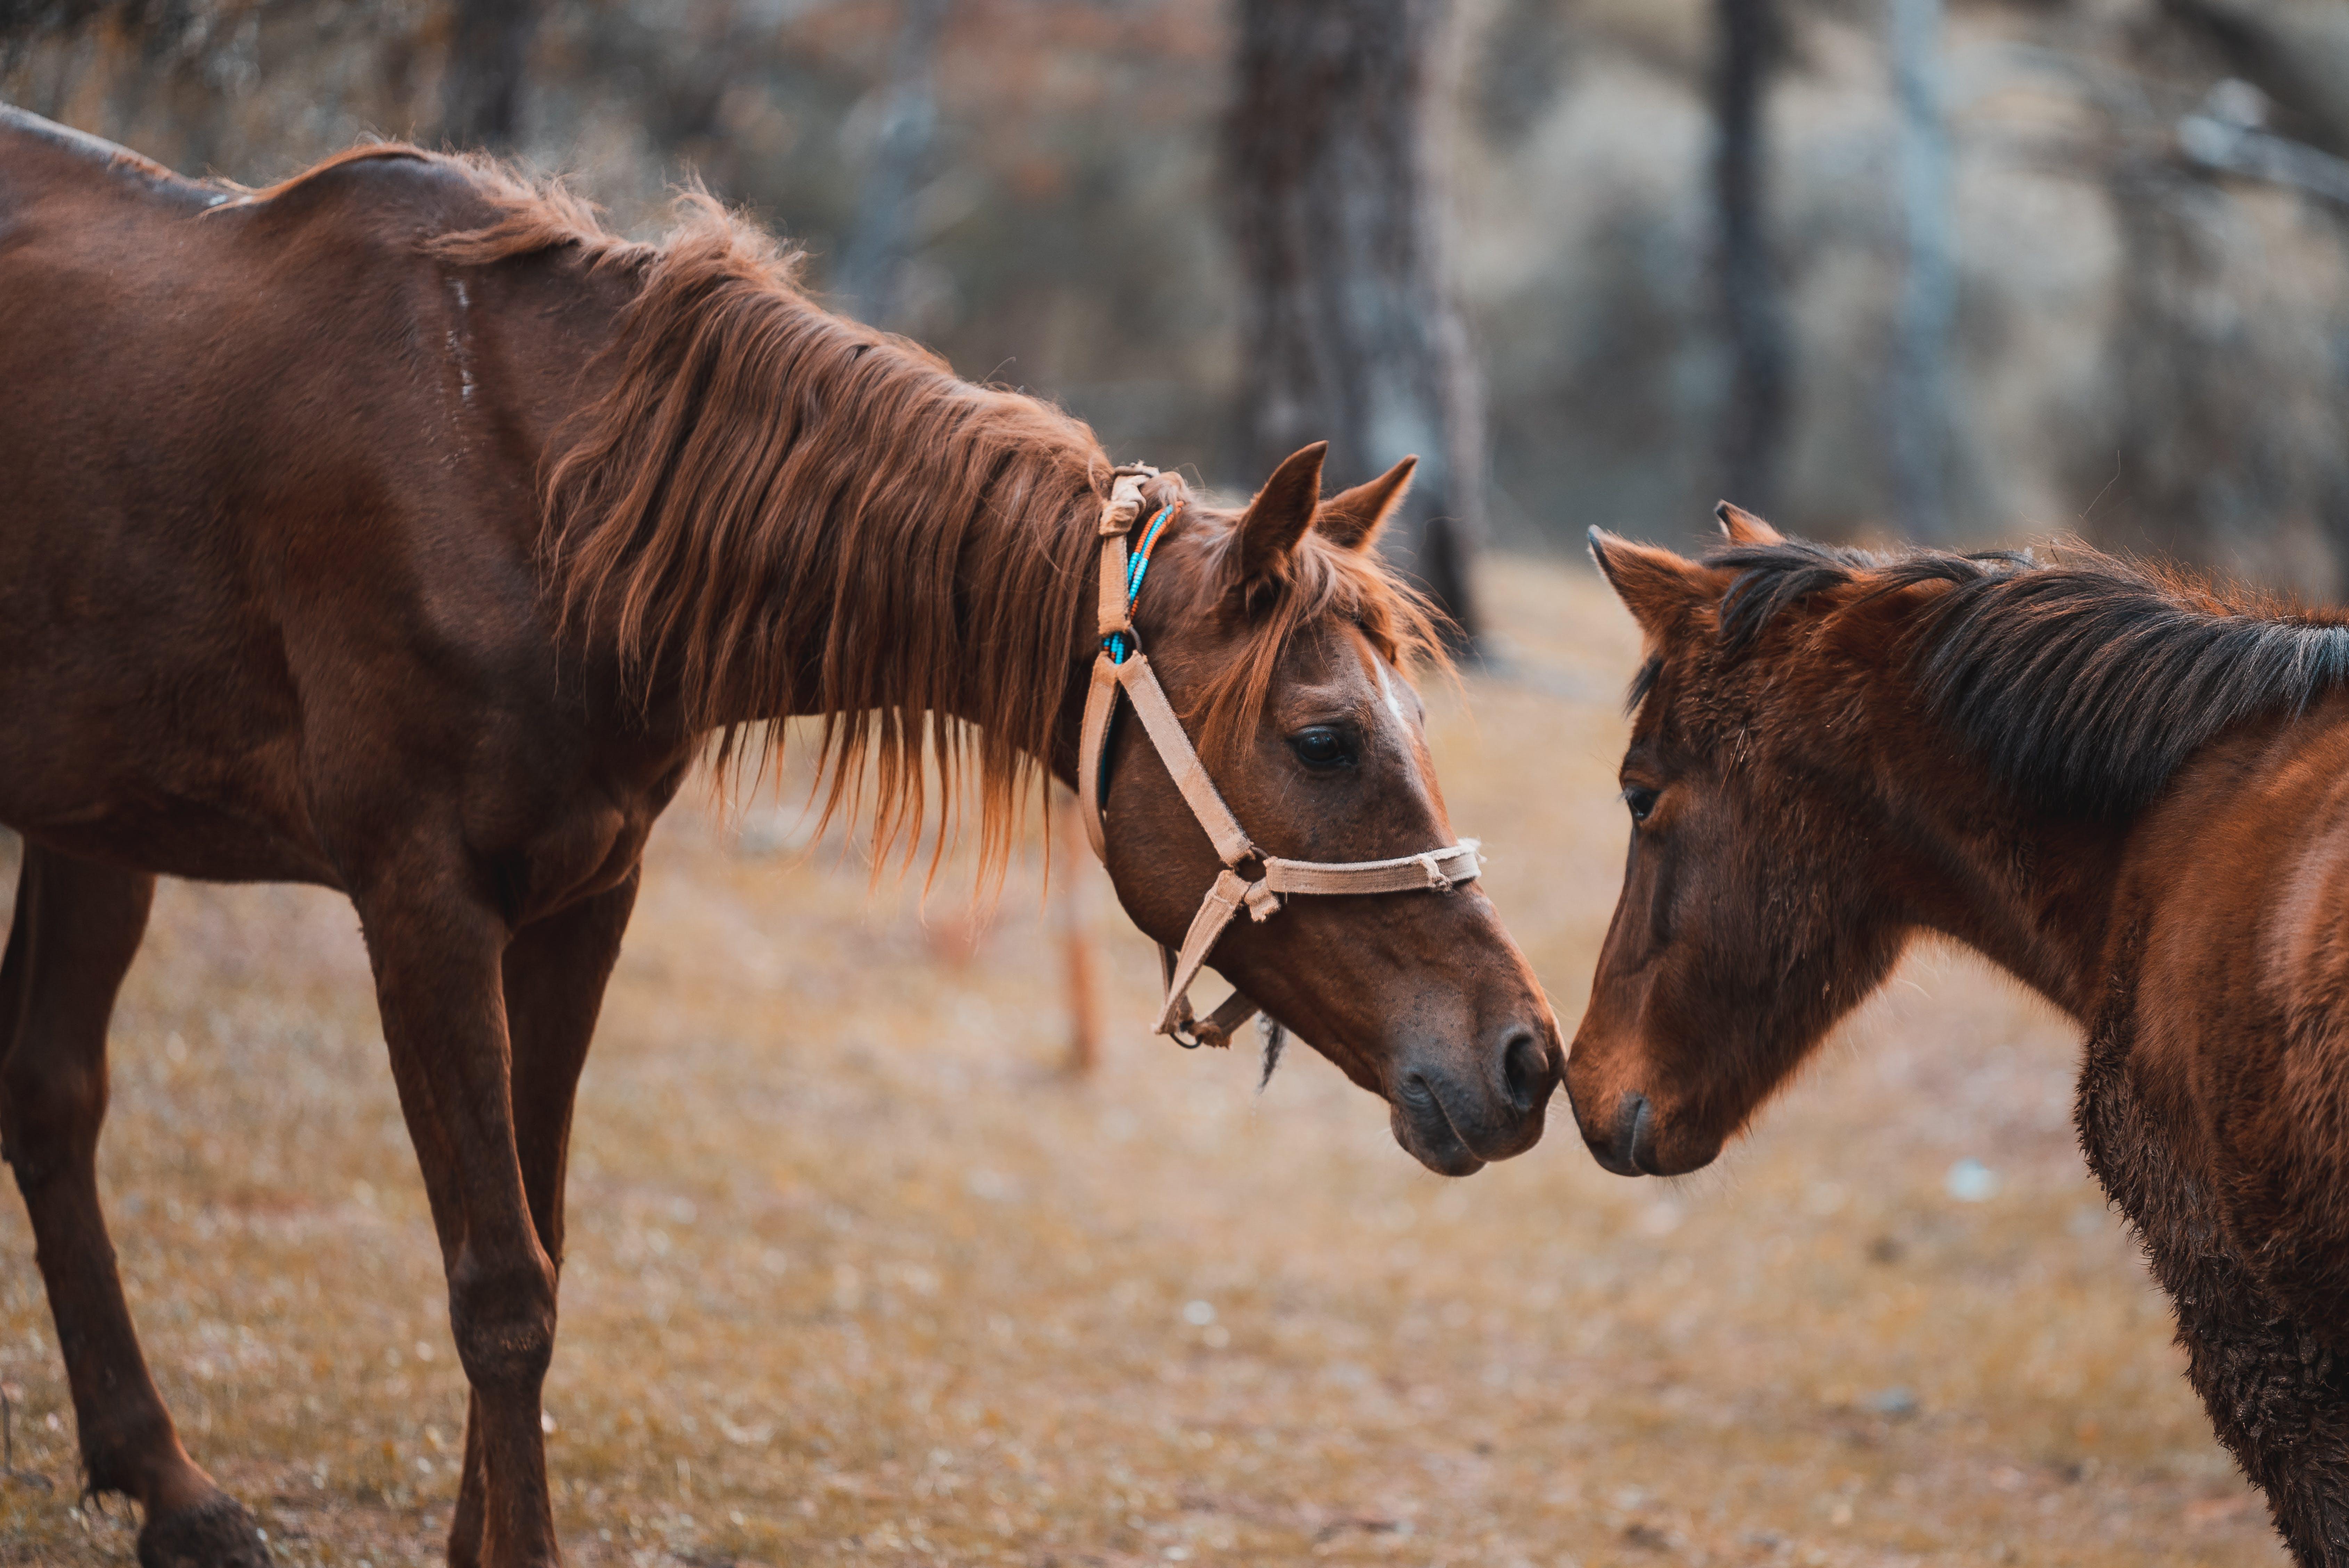 Gratis arkivbilde med buskap, dyreliv, gård, hesteaktig